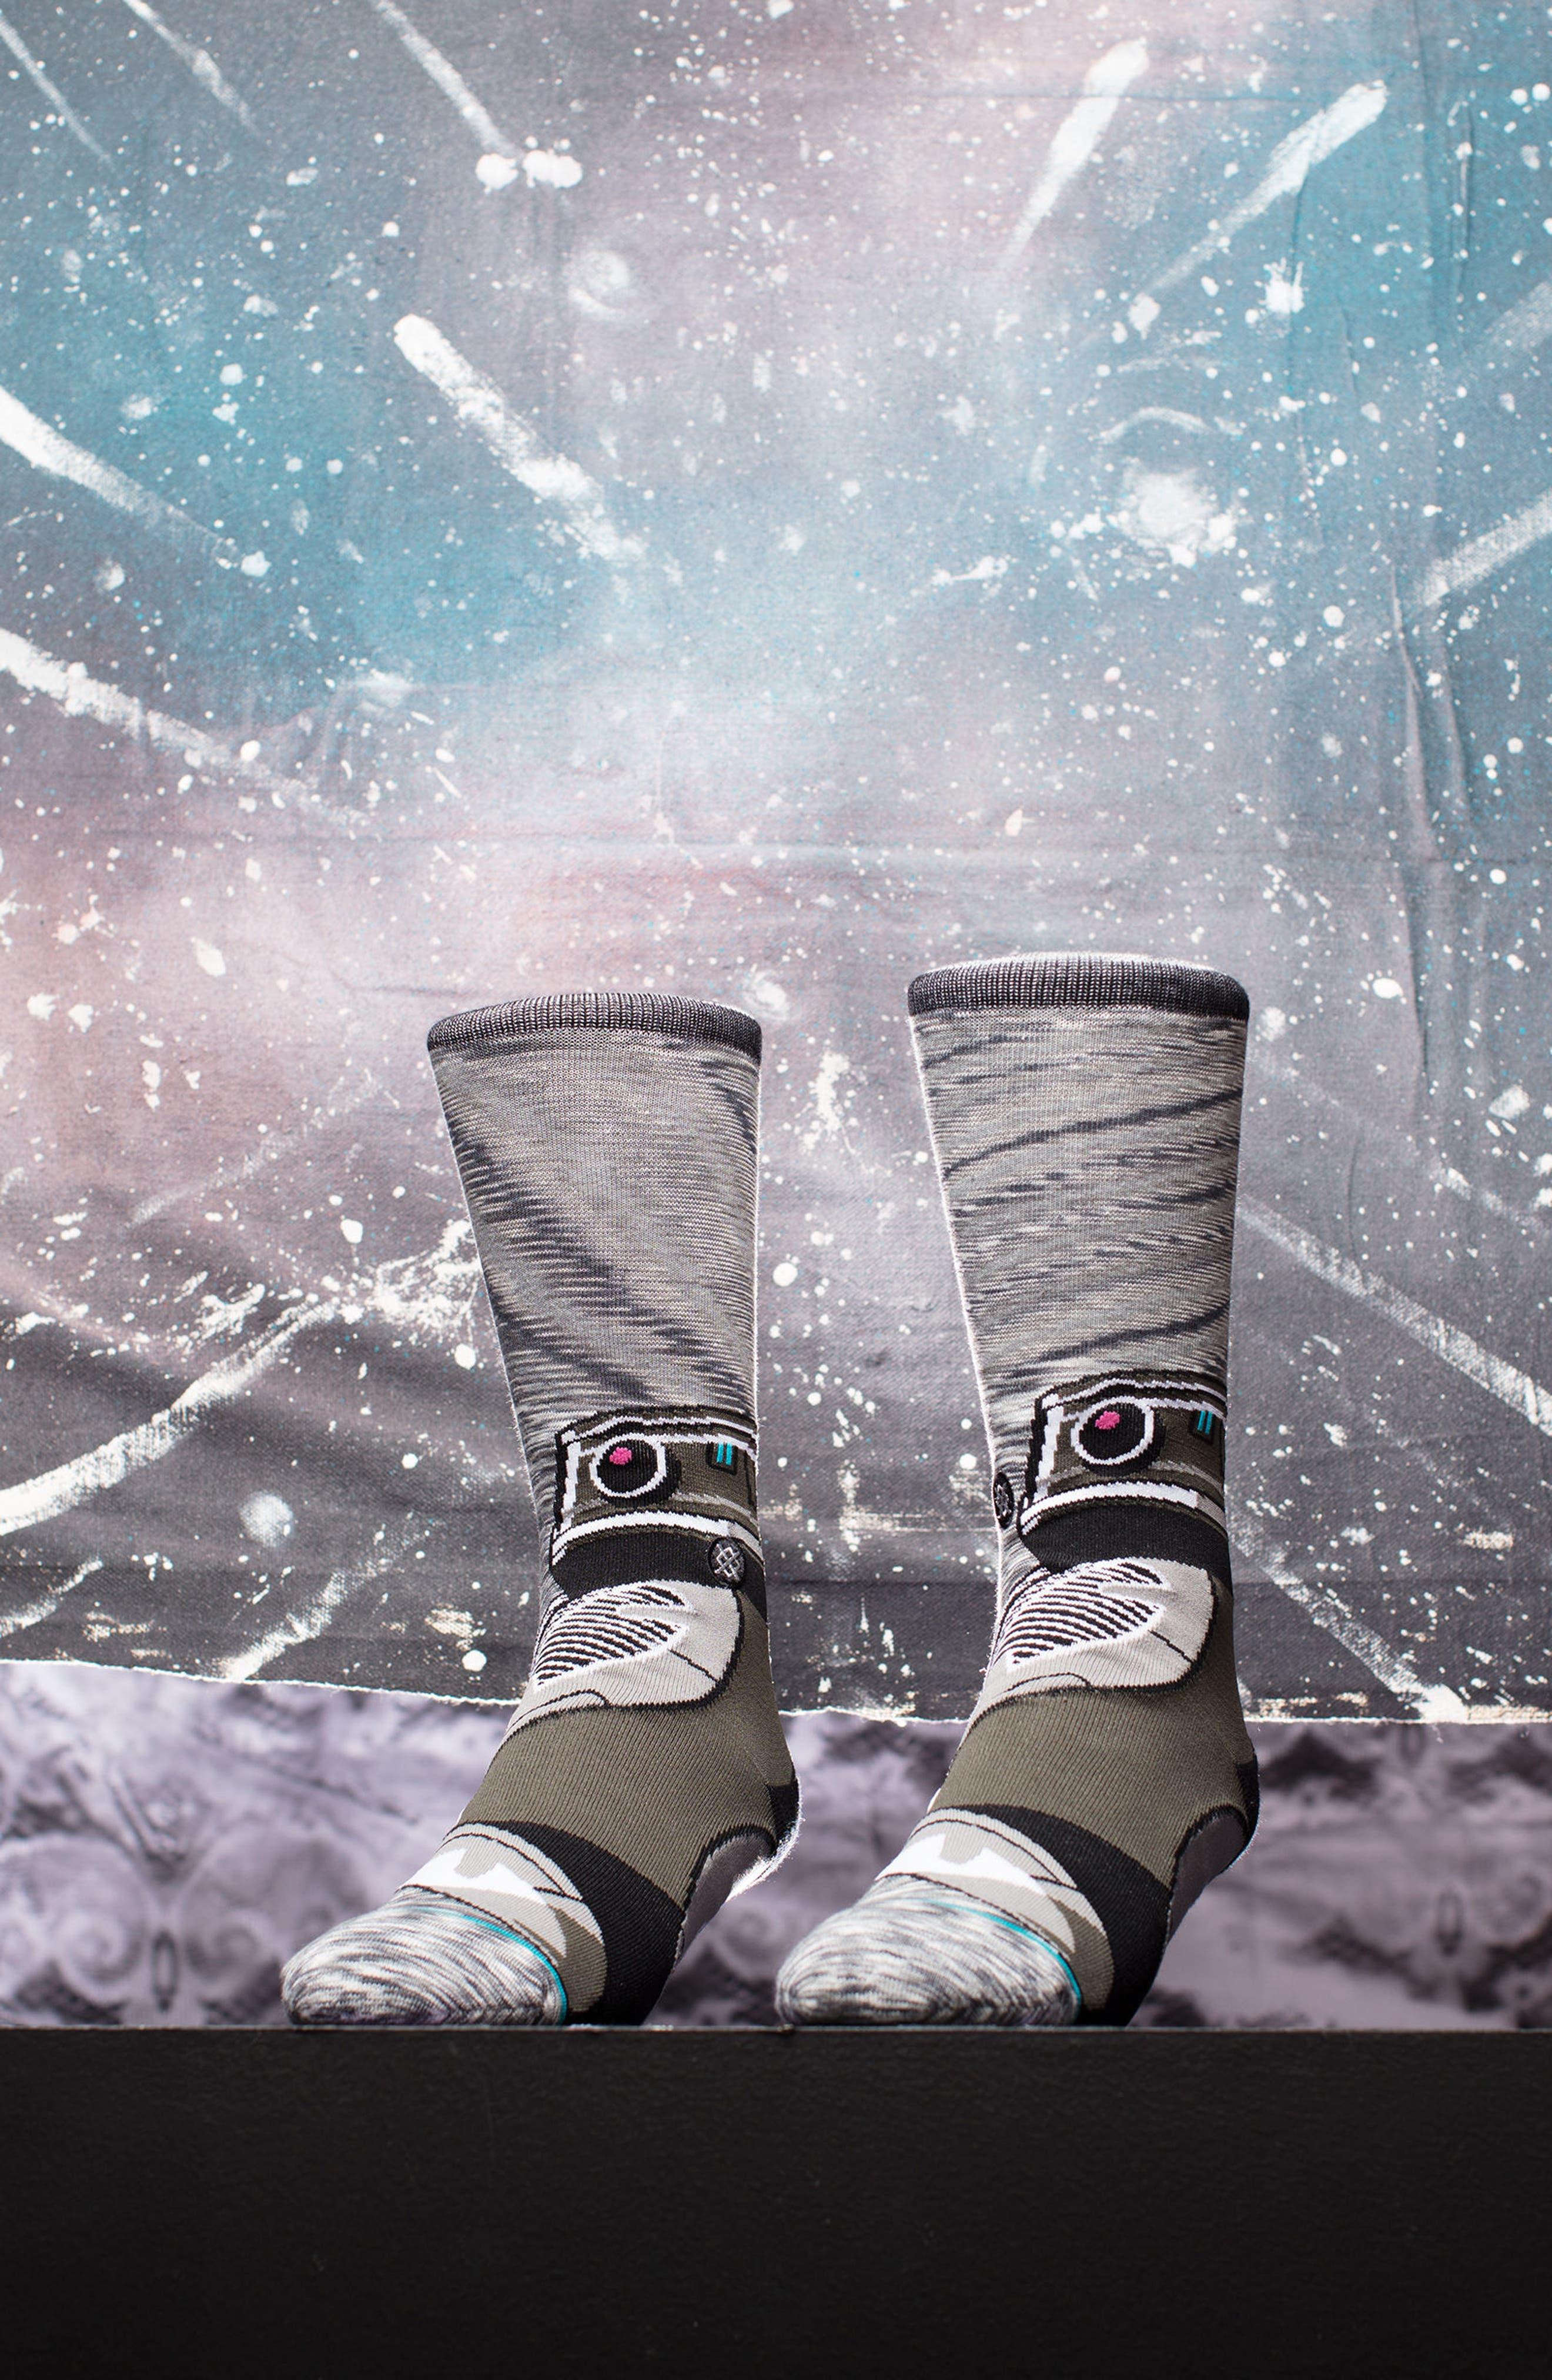 Star Wars<sup>™</sup> Droid 3-Pack Socks,                             Alternate thumbnail 6, color,                             960